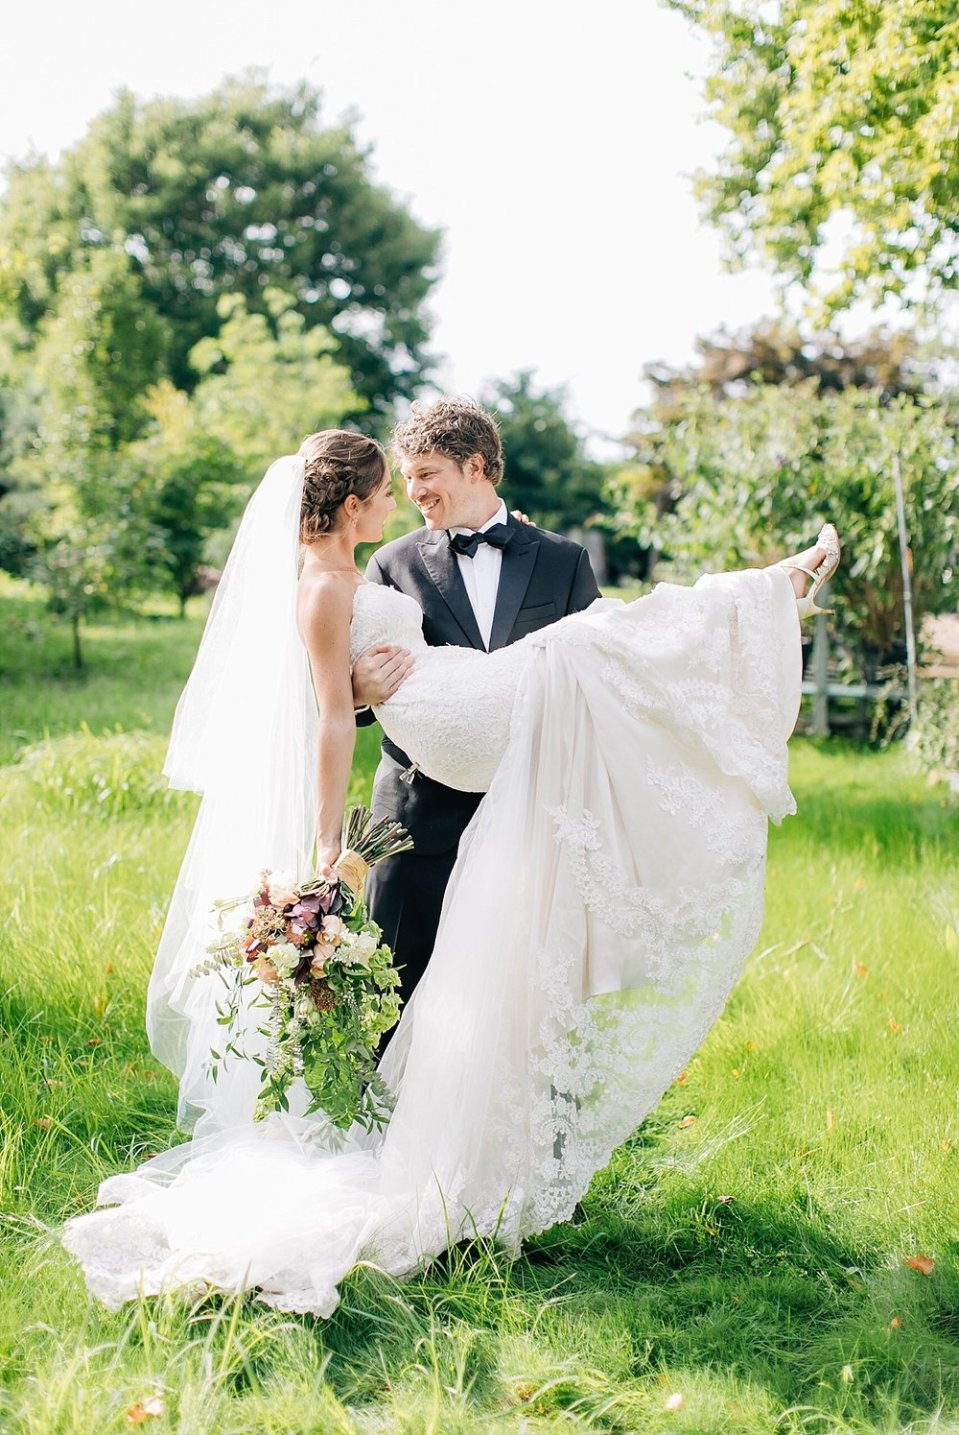 terrain gatherings glen mills pa romantic garden wedding photography magdalena studios 0036